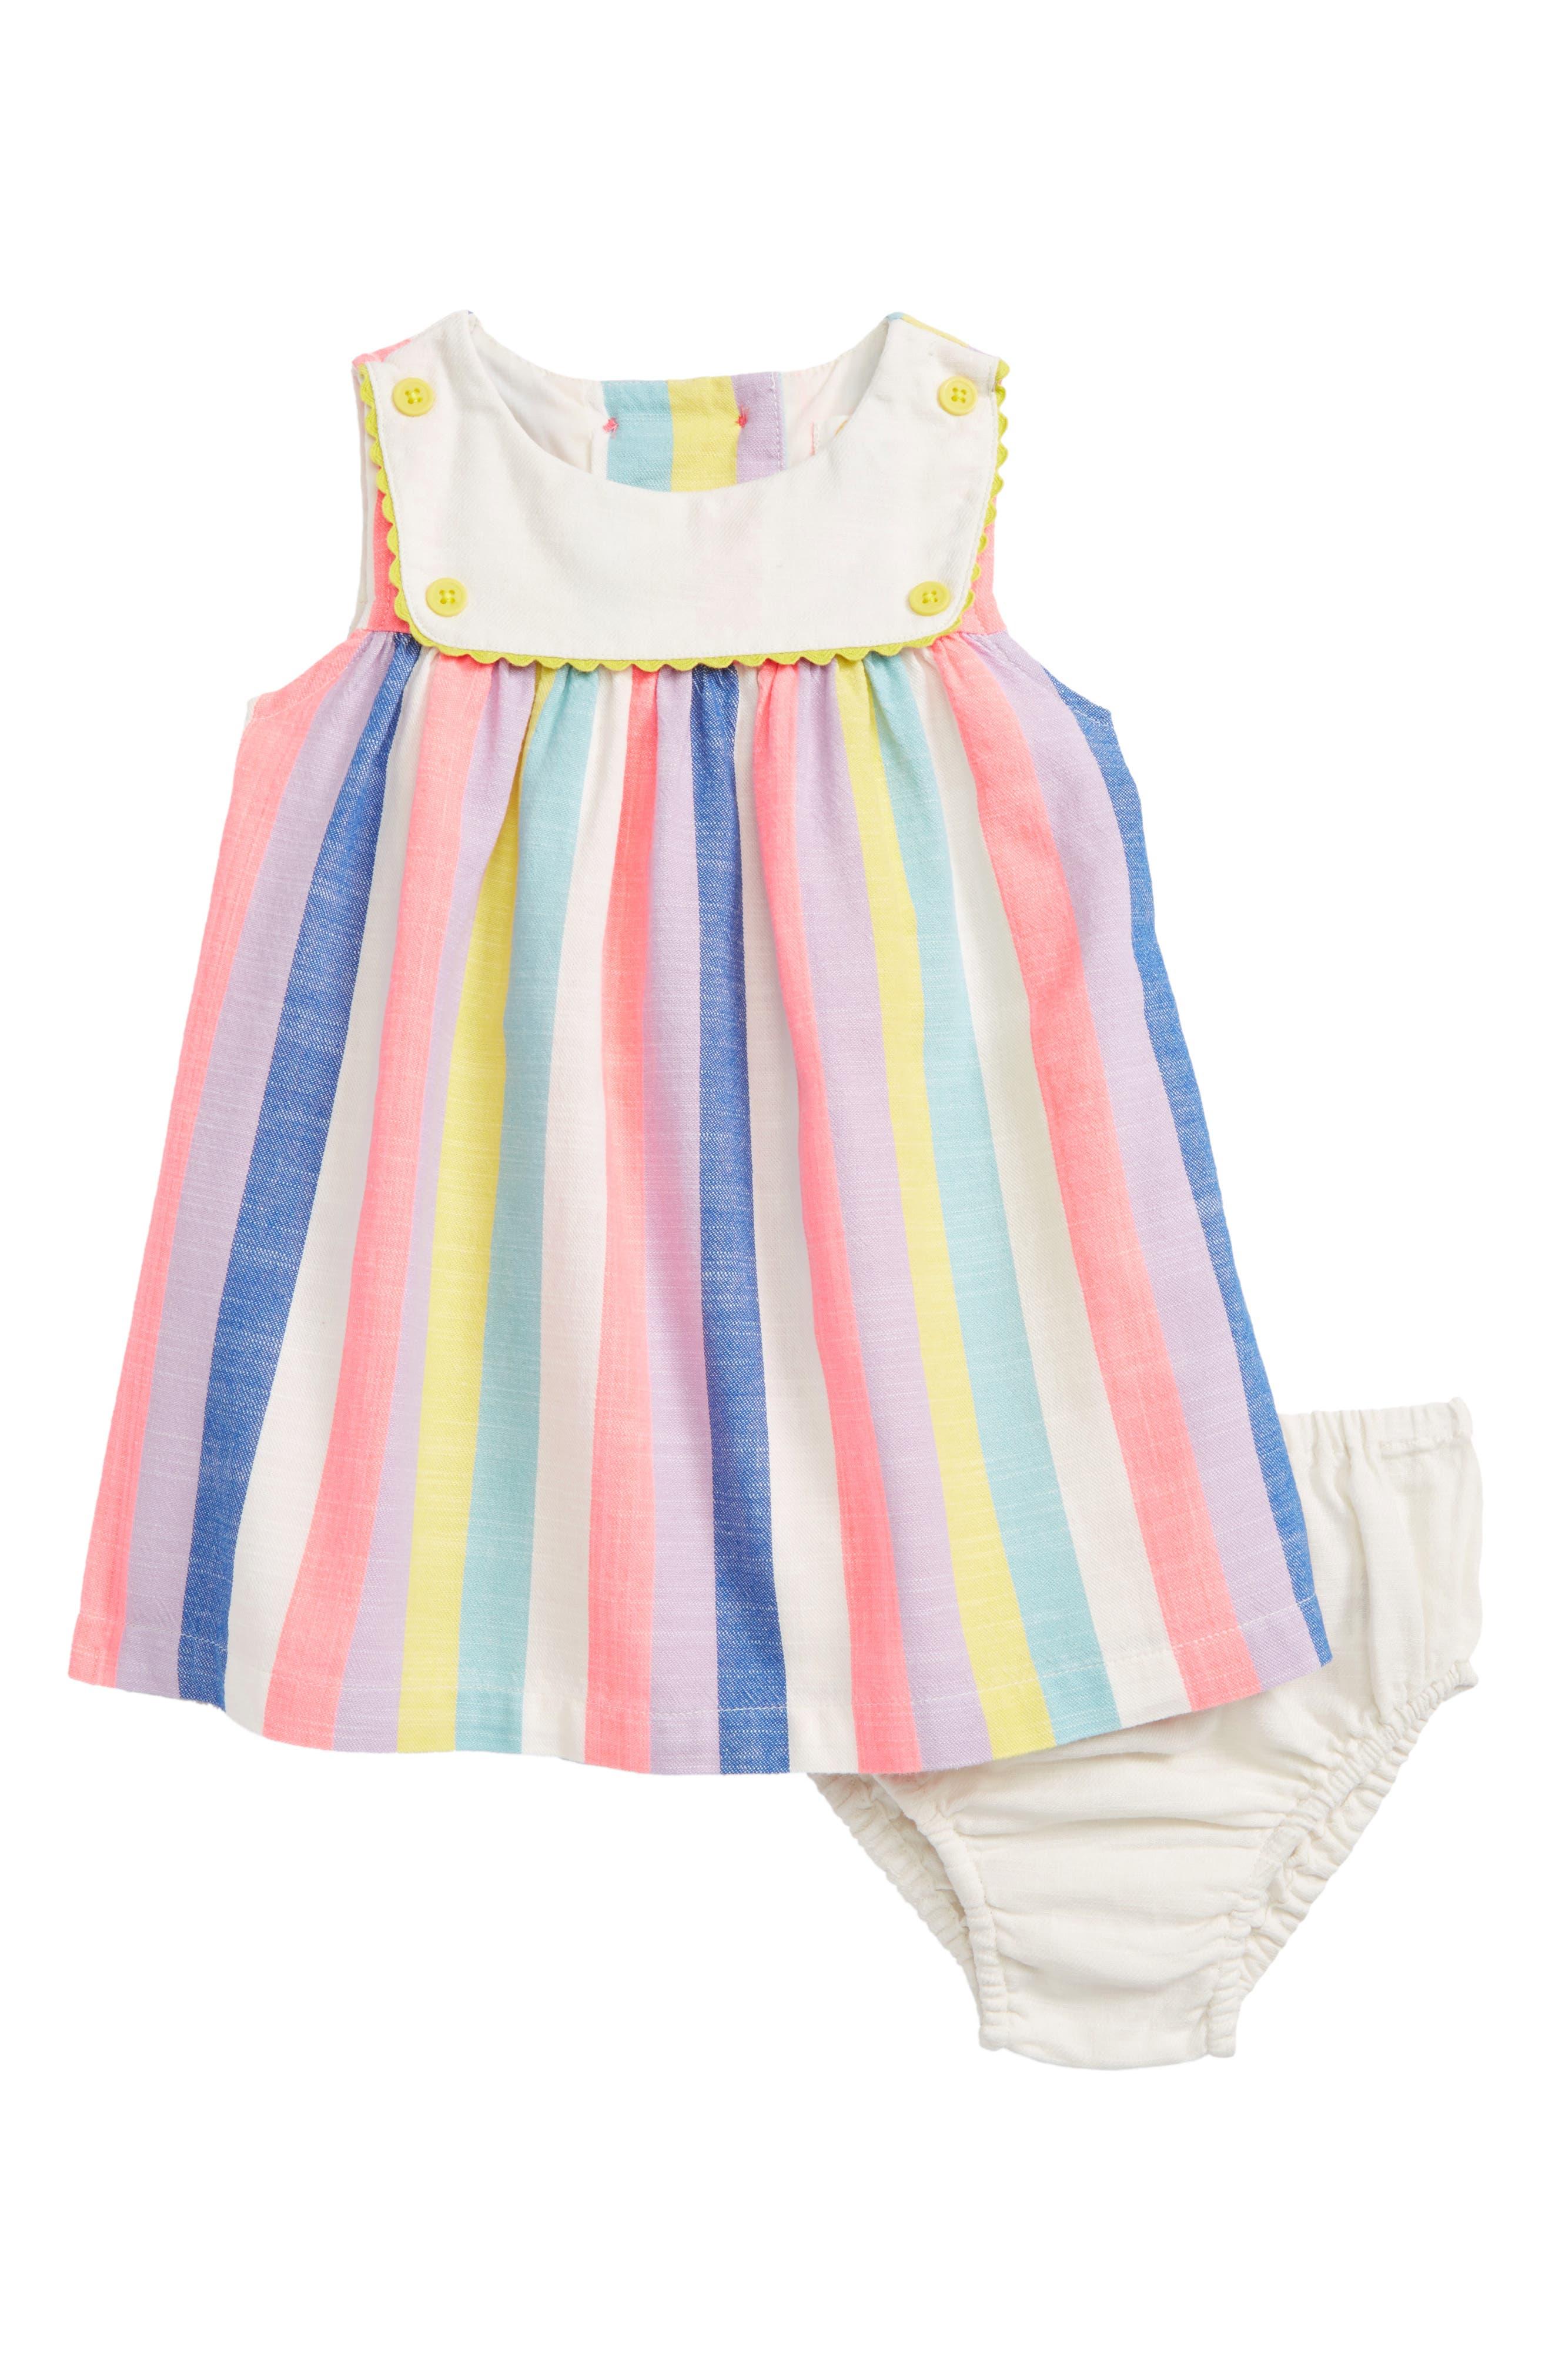 Sailor Dress,                             Main thumbnail 1, color,                             Candy Stripe